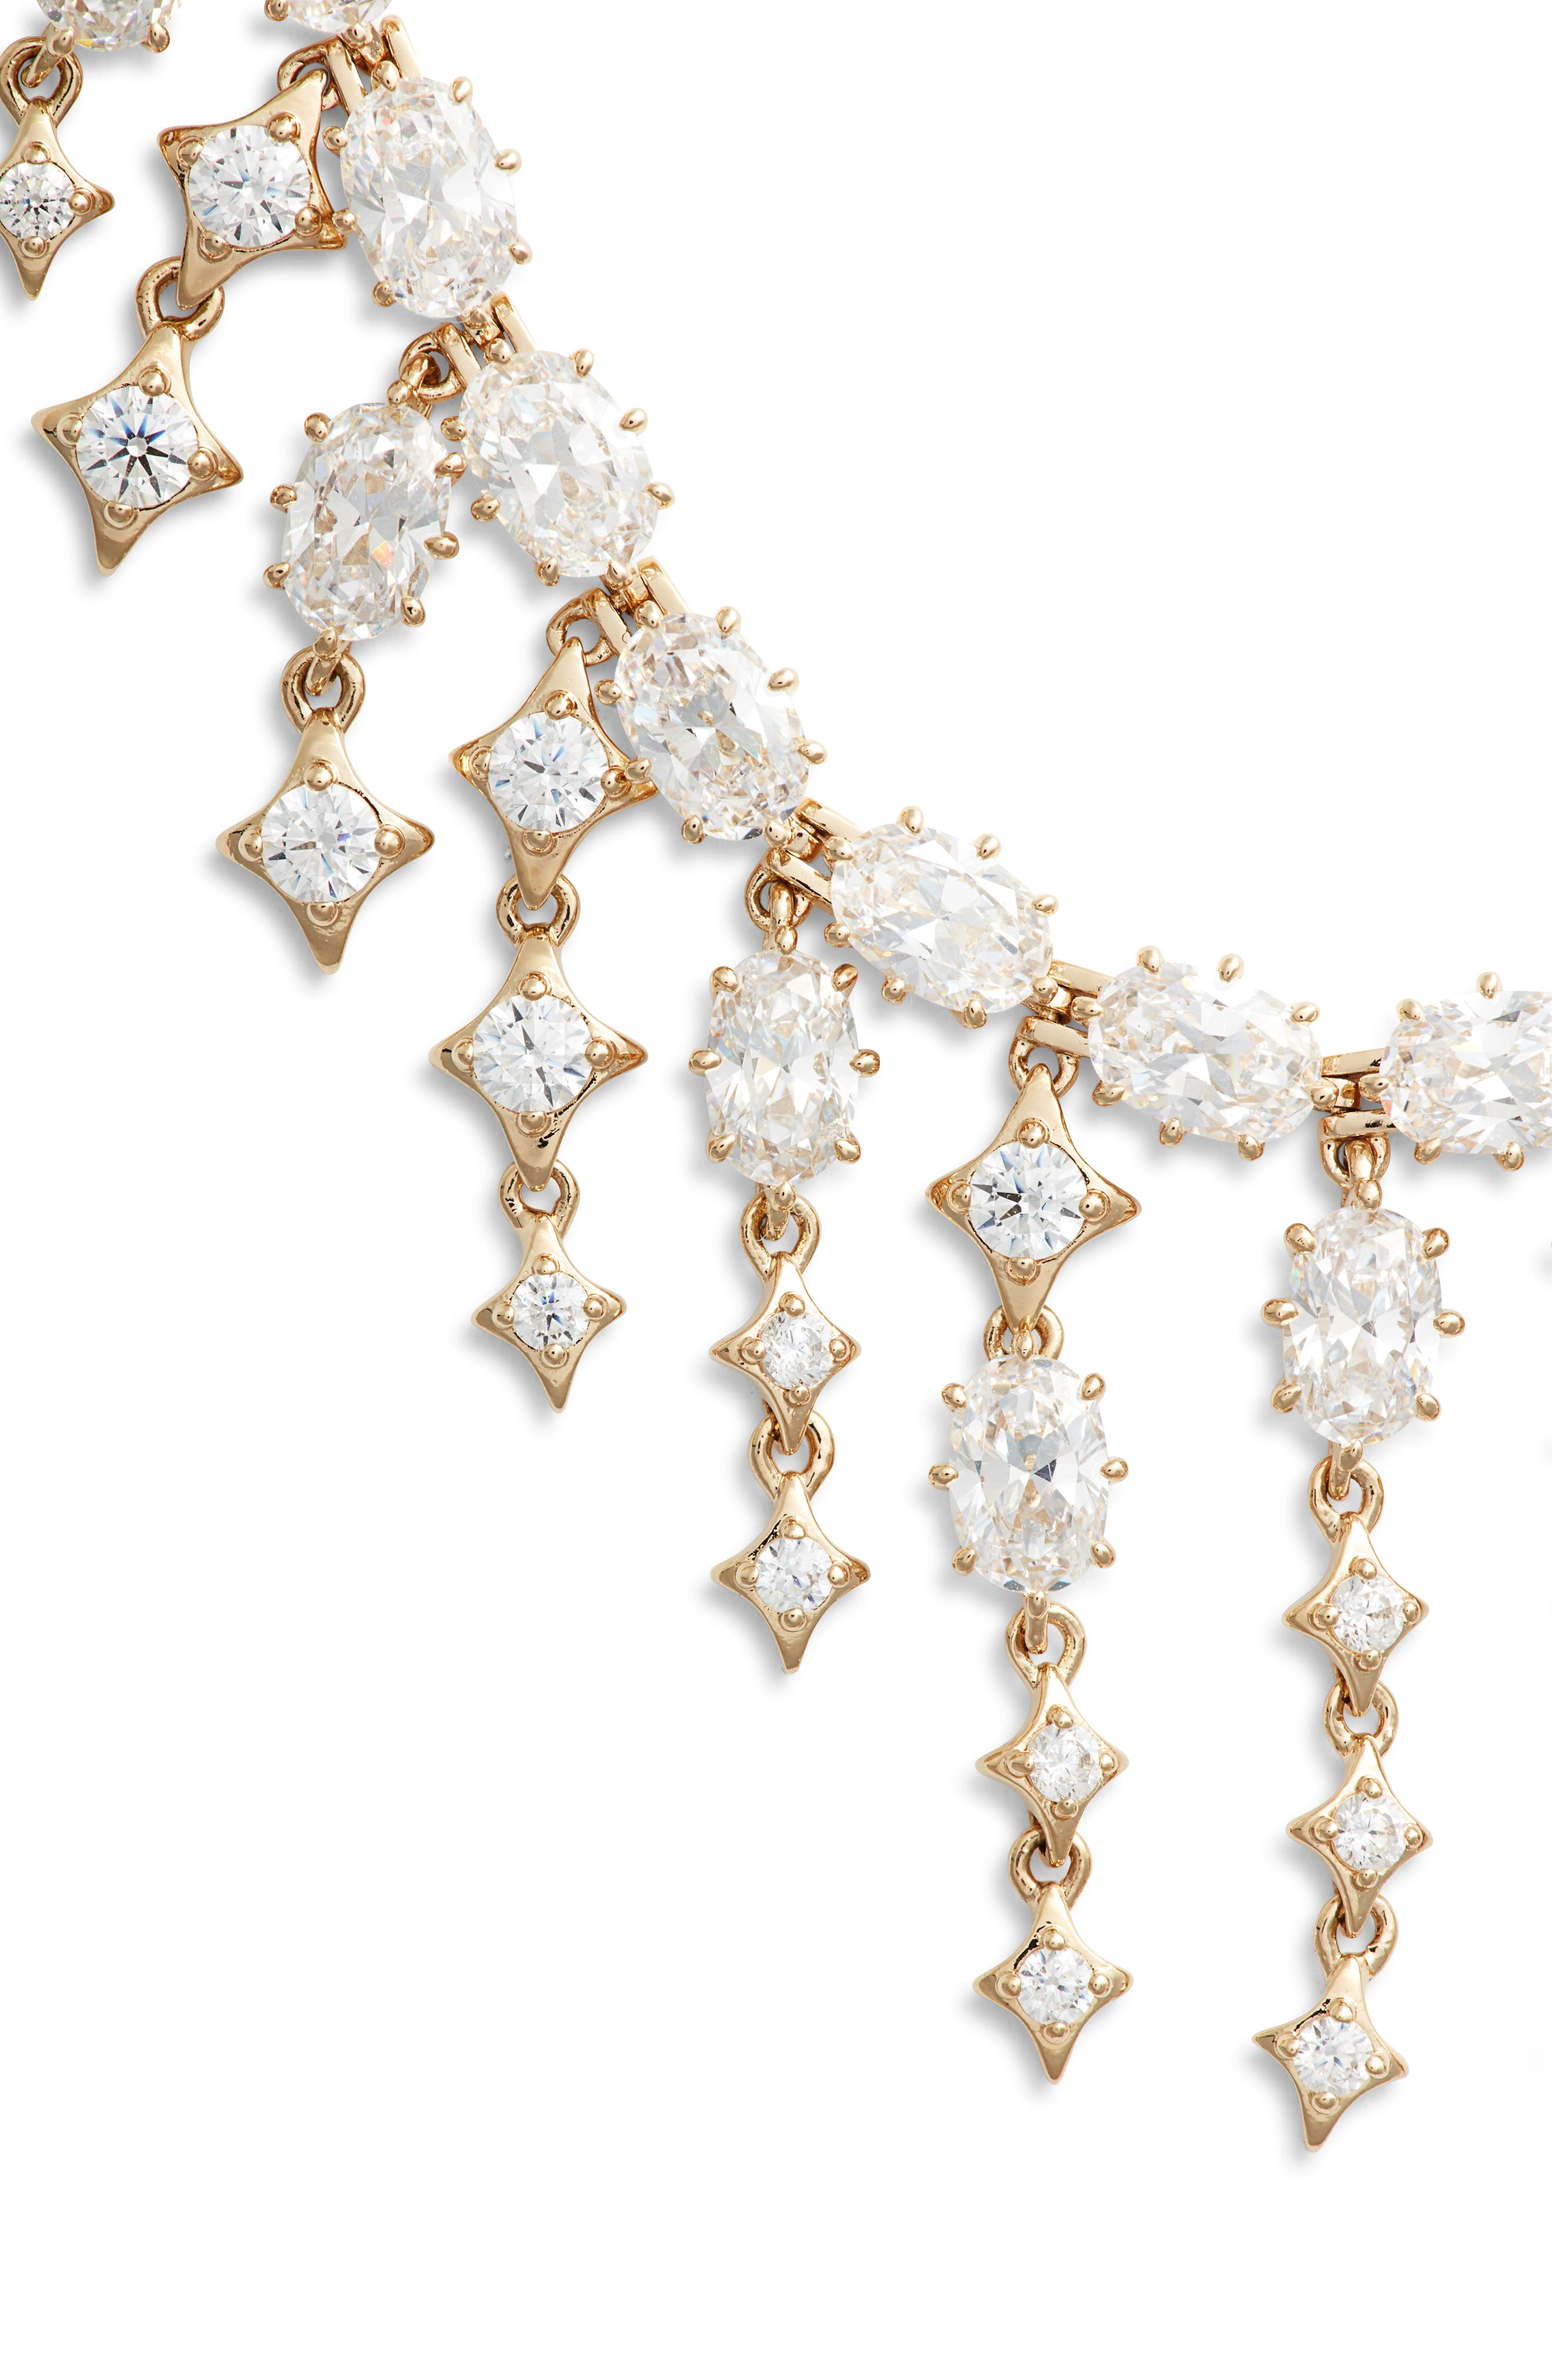 Crystal Fringe Necklace,                             Alternate thumbnail 2, color,                             GOLD/ CLEAR